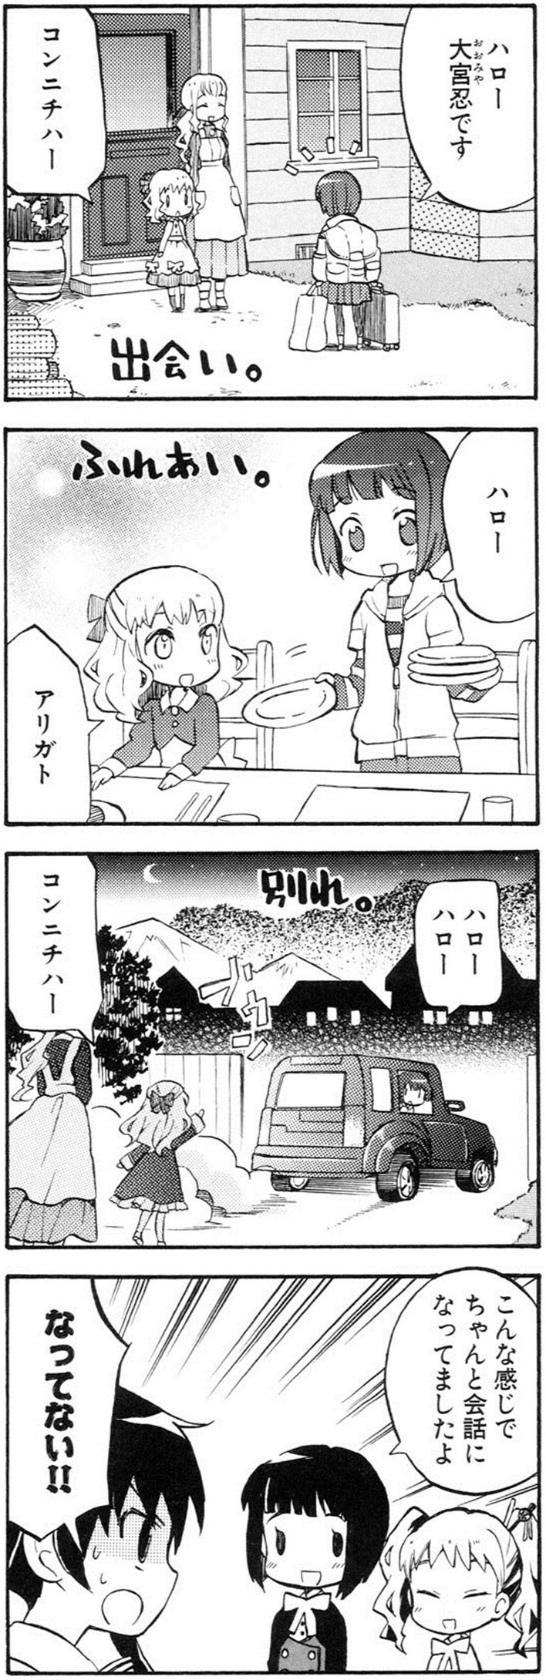 http://blog-imgs-61.fc2.com/k/y/a/kyarasokuhou/1373302030624.jpg